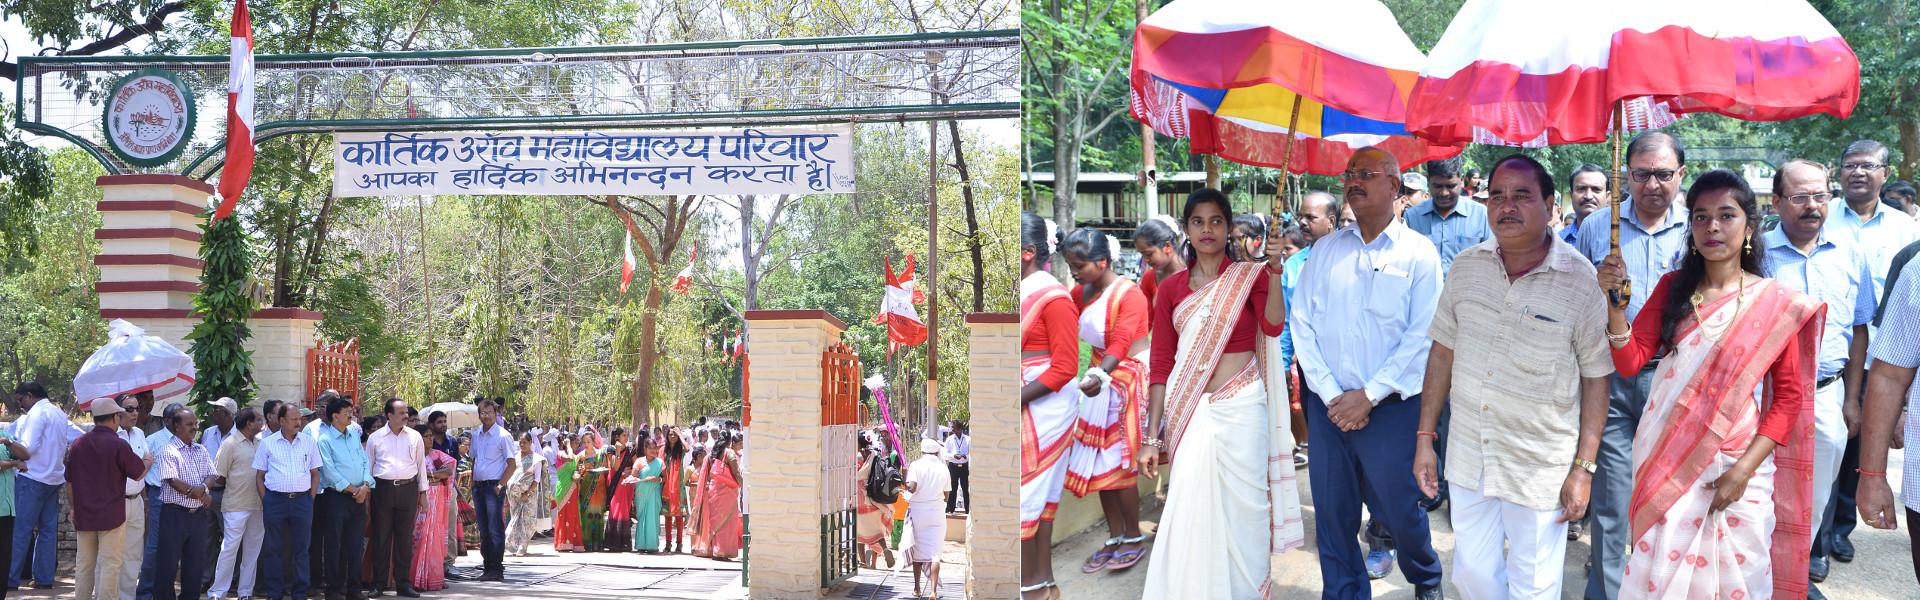 Kartik Oraon College, Gumla